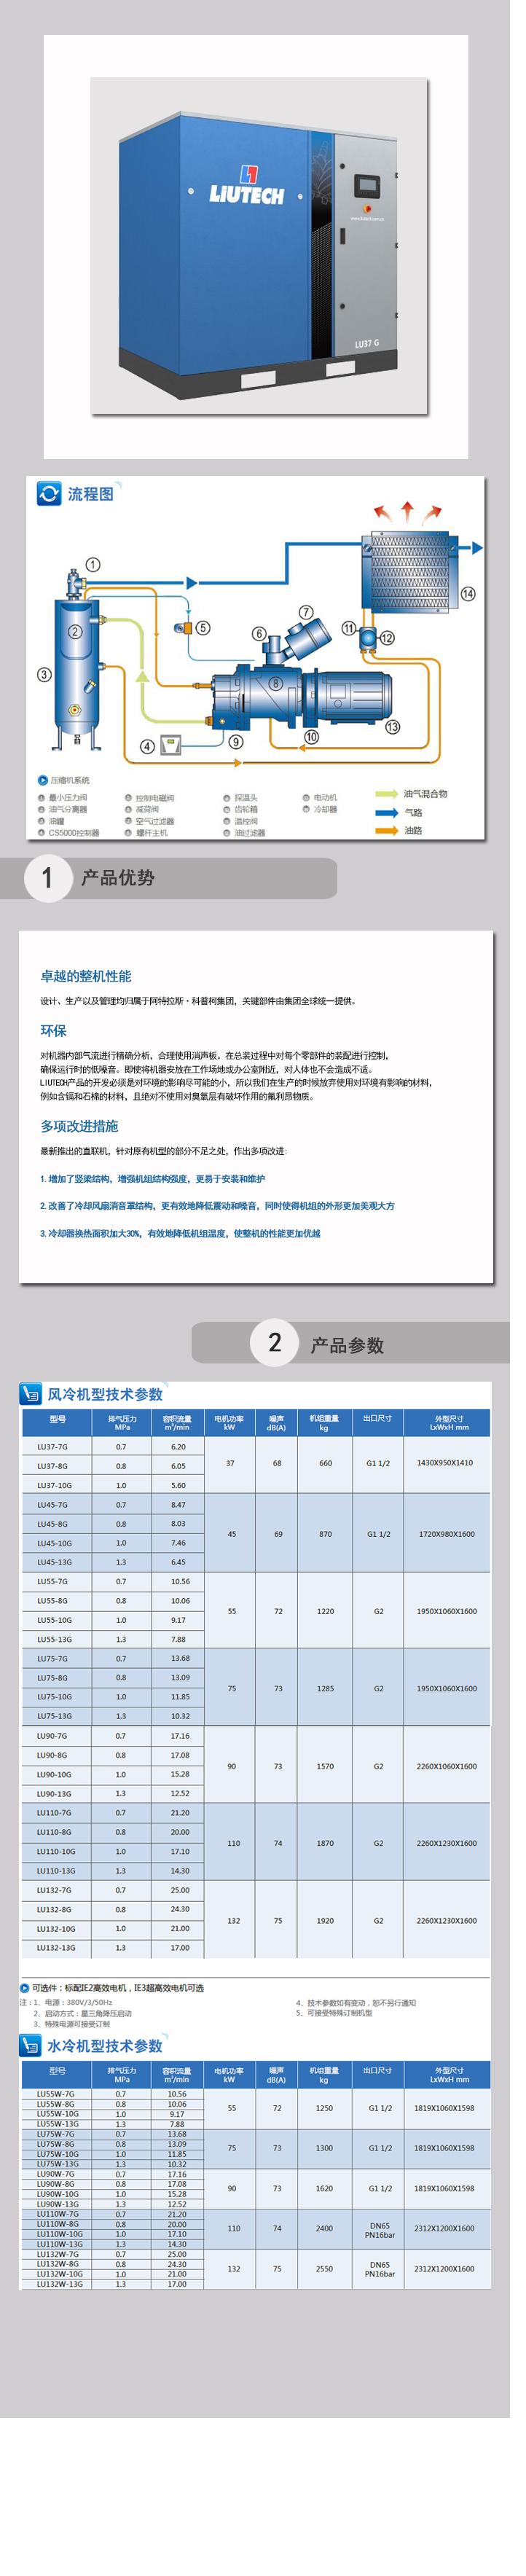 LU37-132G高效齒輪定頻系列1.jpg